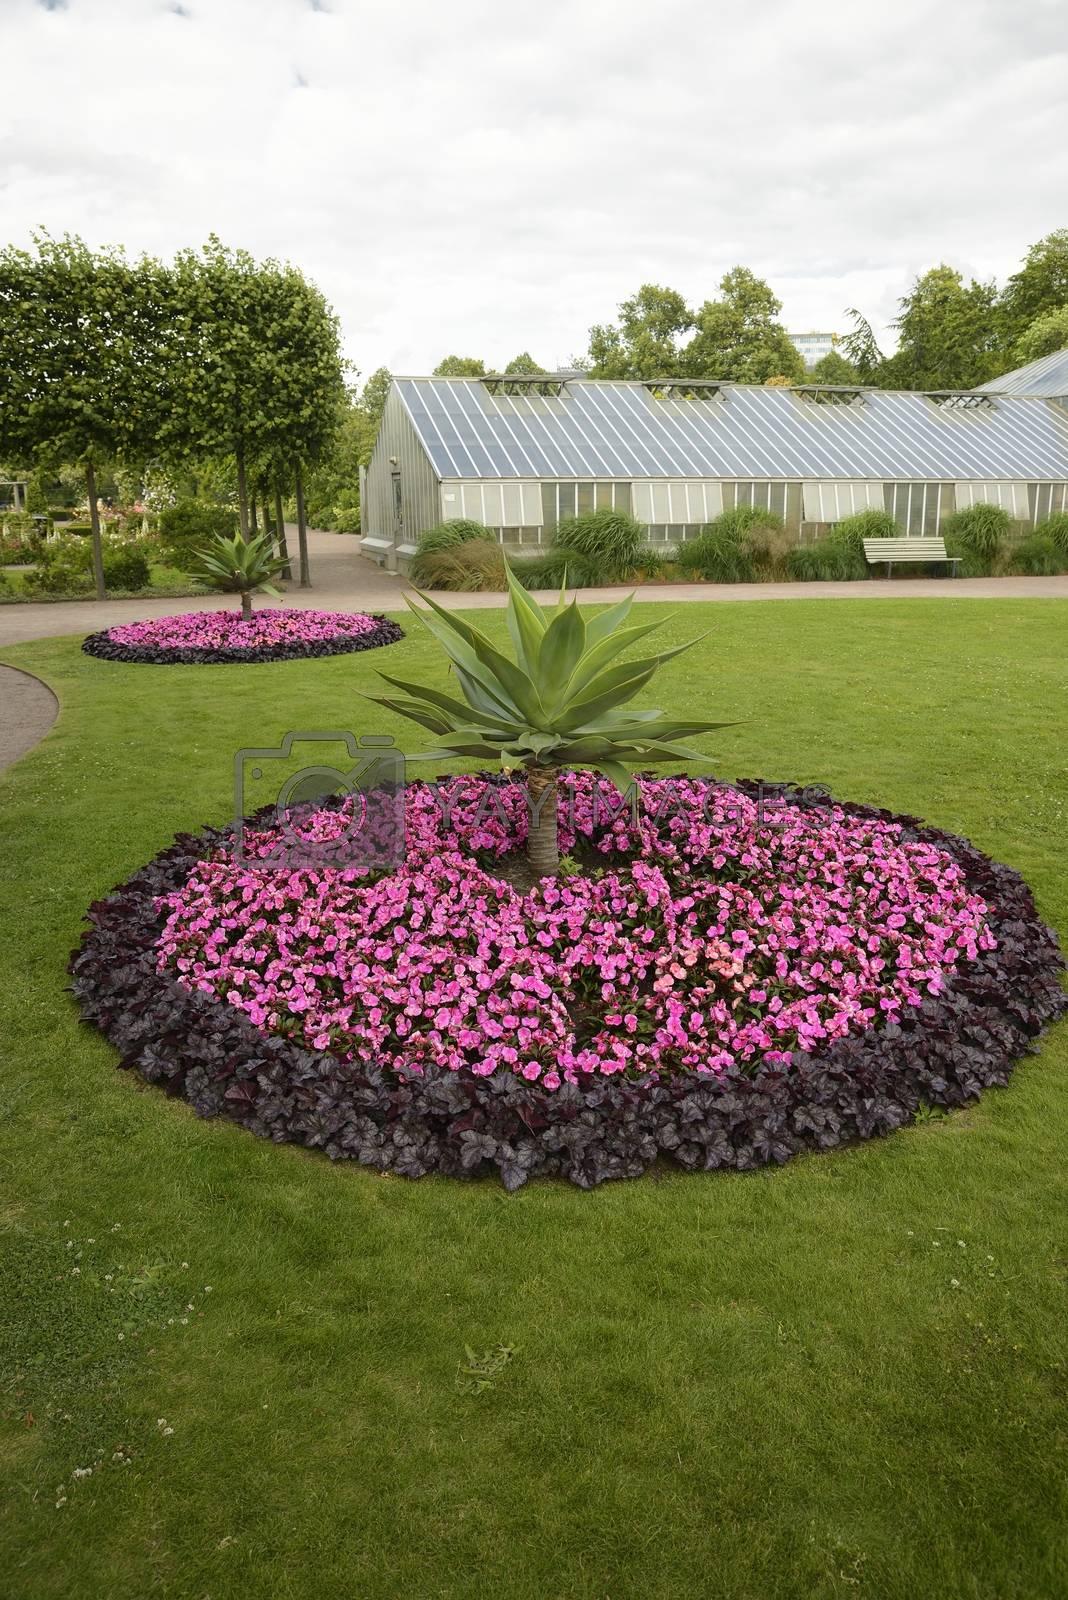 Flowerbed in park